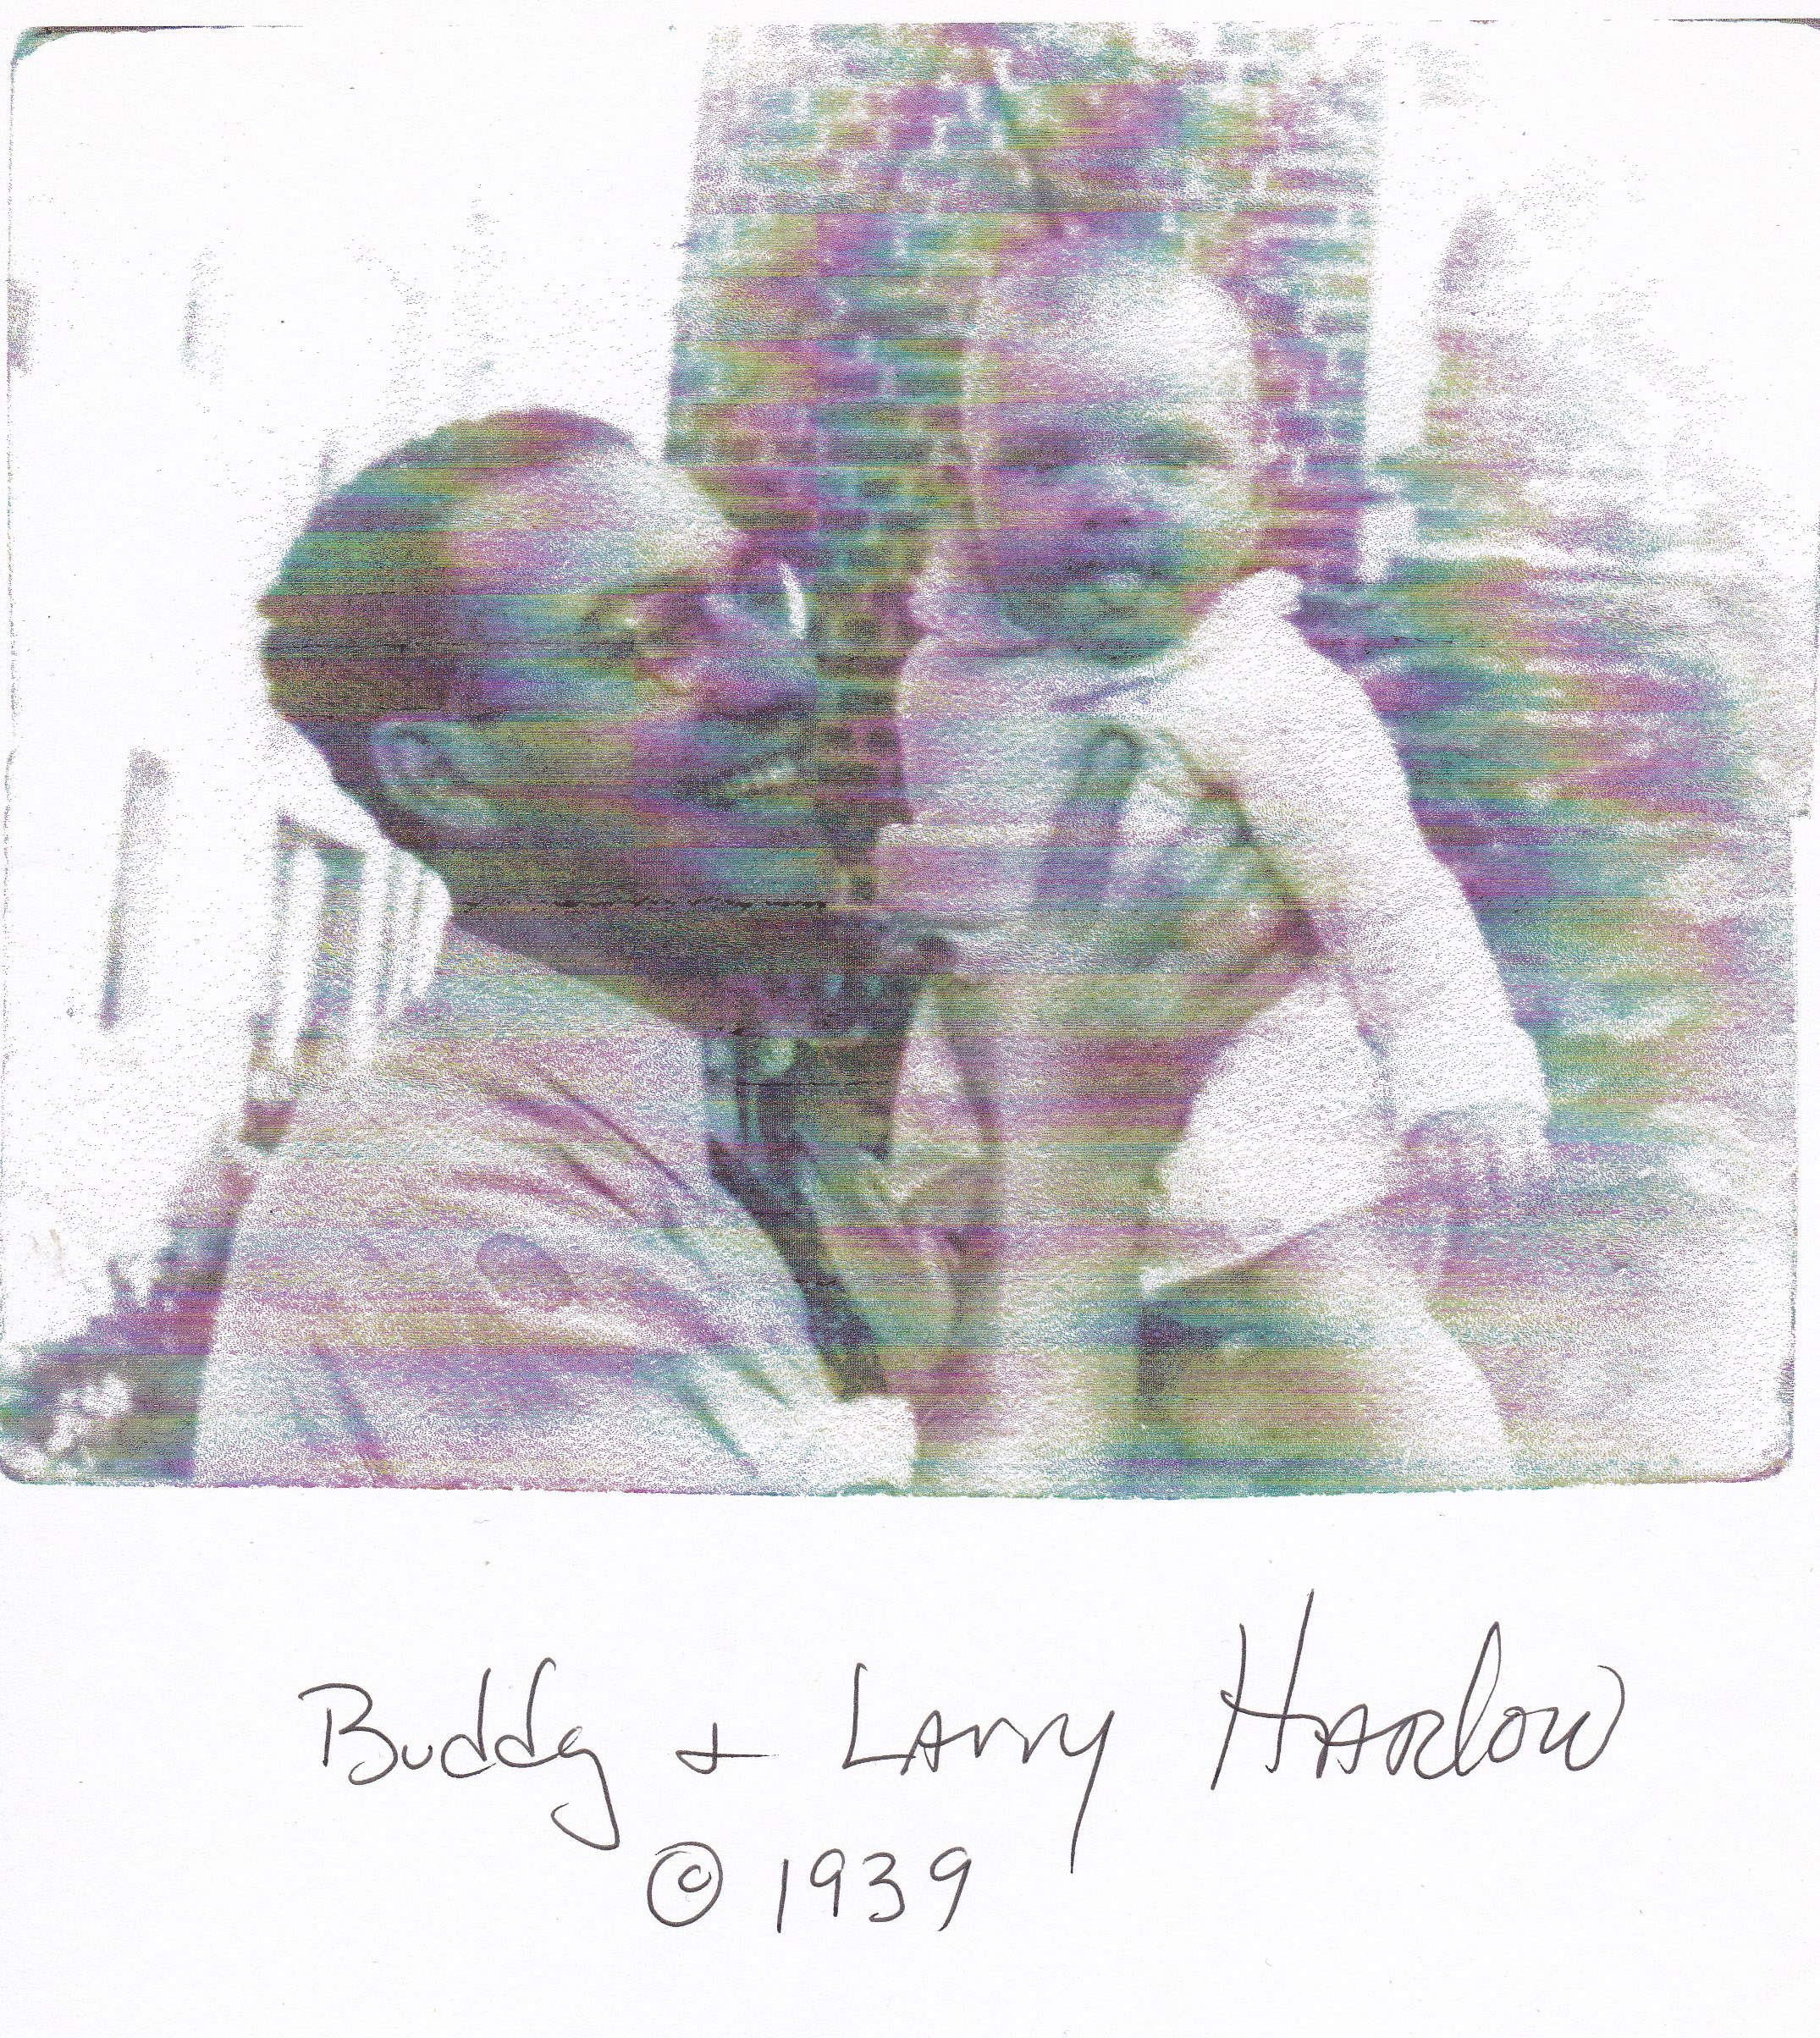 BabyHarlow1939.jpg